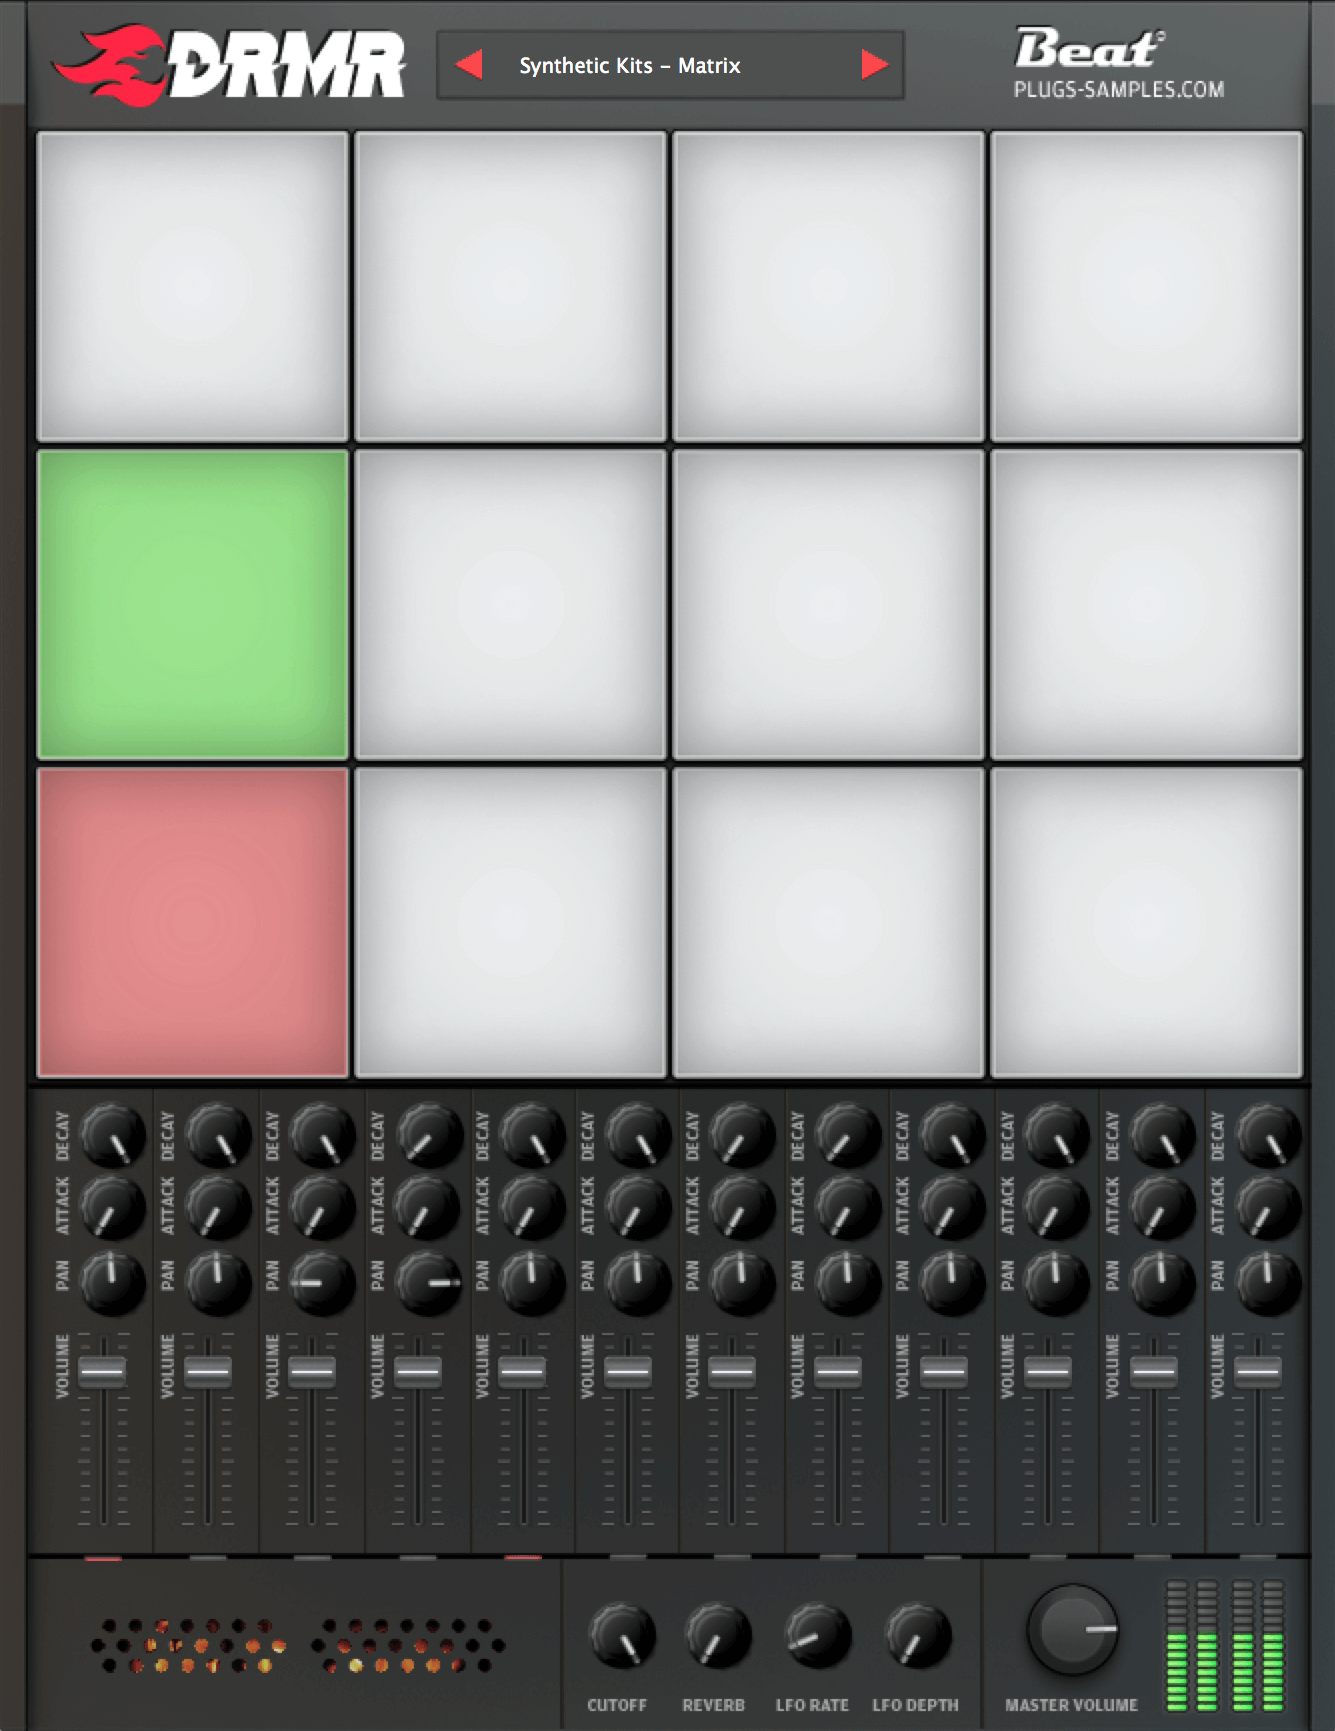 Beat releases Beat DRMR free drum sampler VST/AU plugin | Free VST